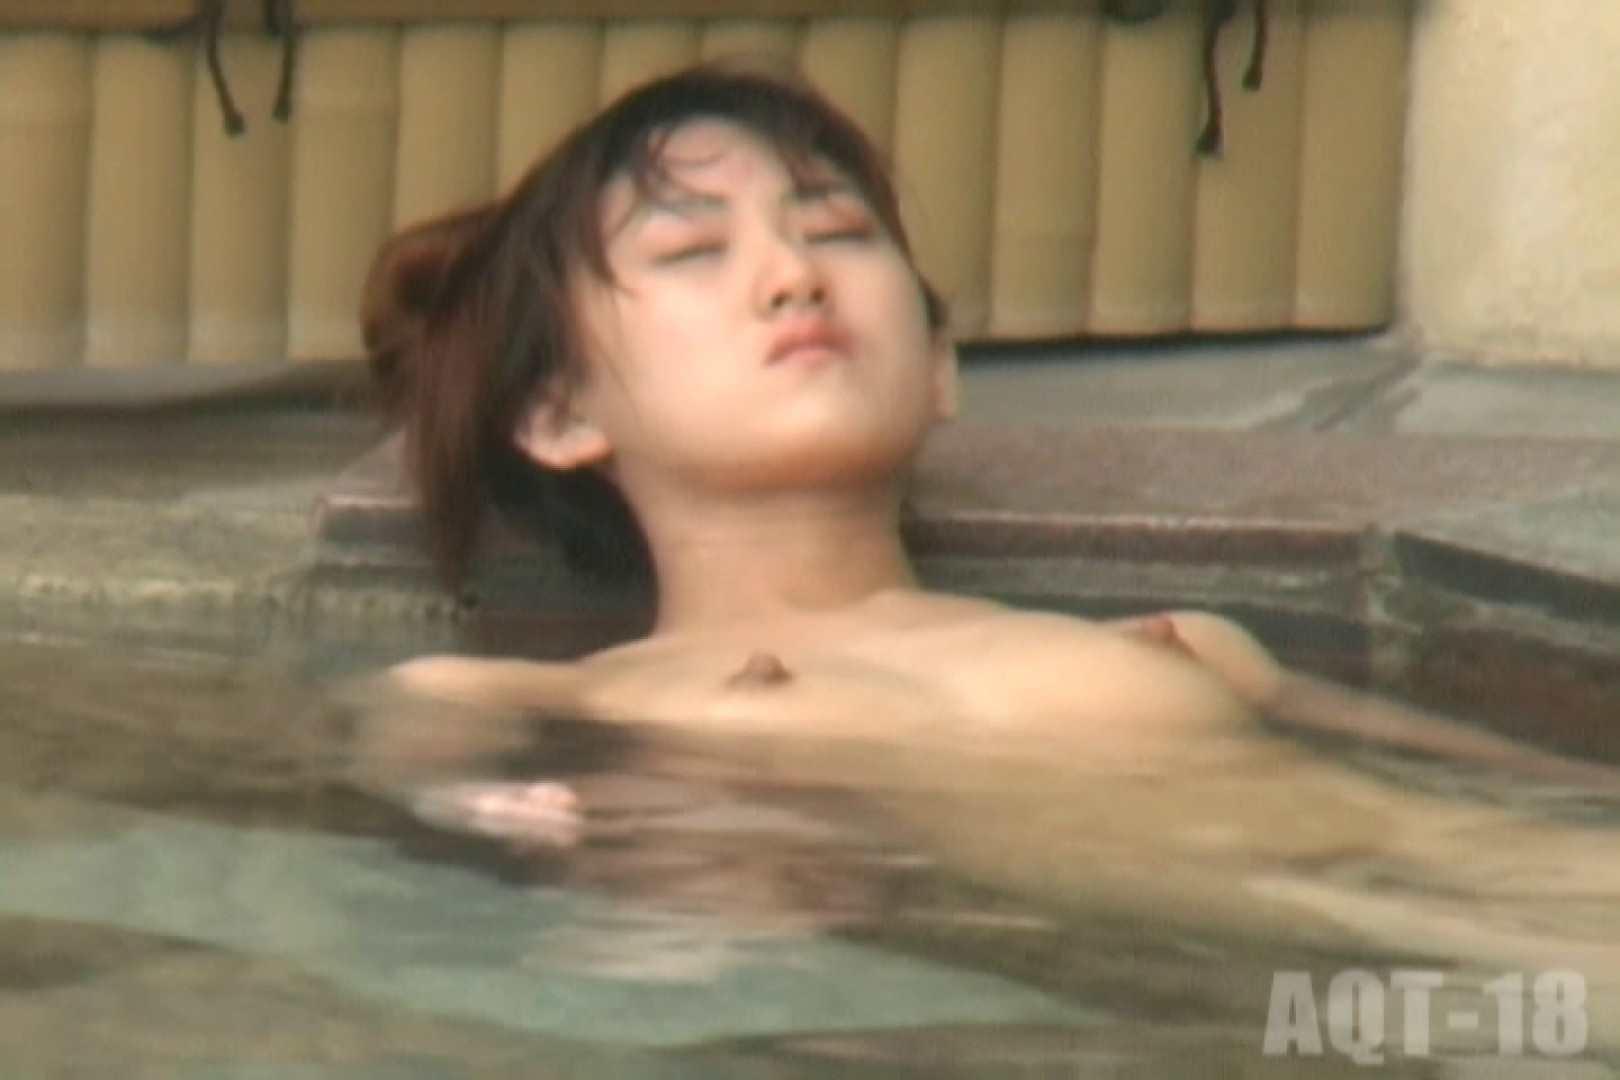 Aquaな露天風呂Vol.862 盗撮 AV無料動画キャプチャ 92PICs 26